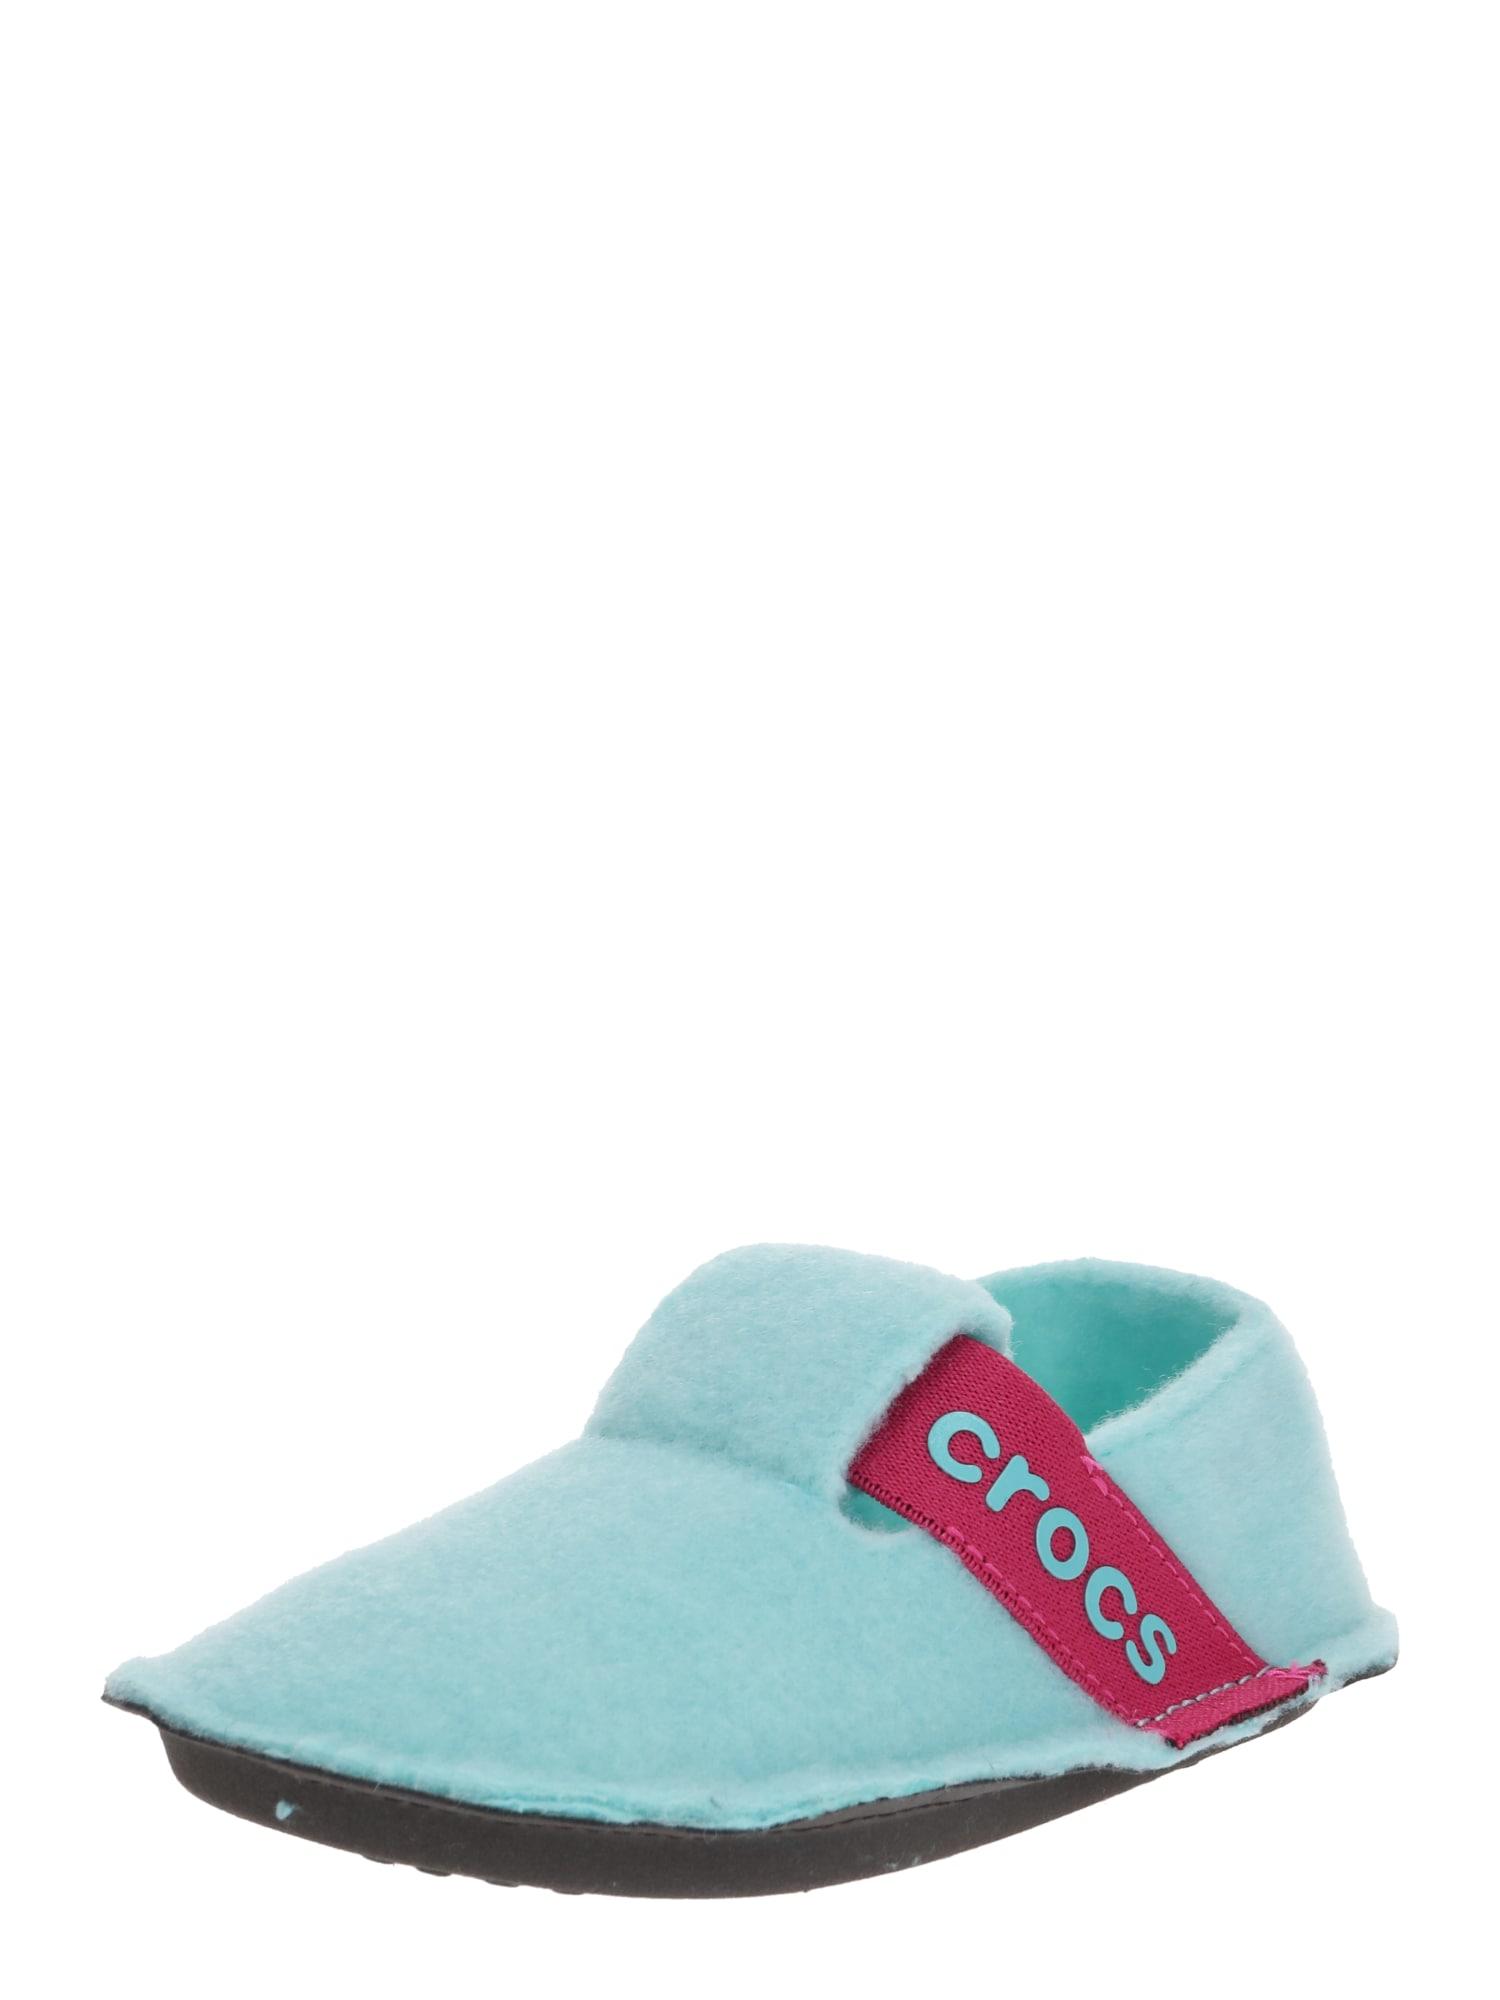 Pantofle Classic Slipper K světlemodrá Crocs